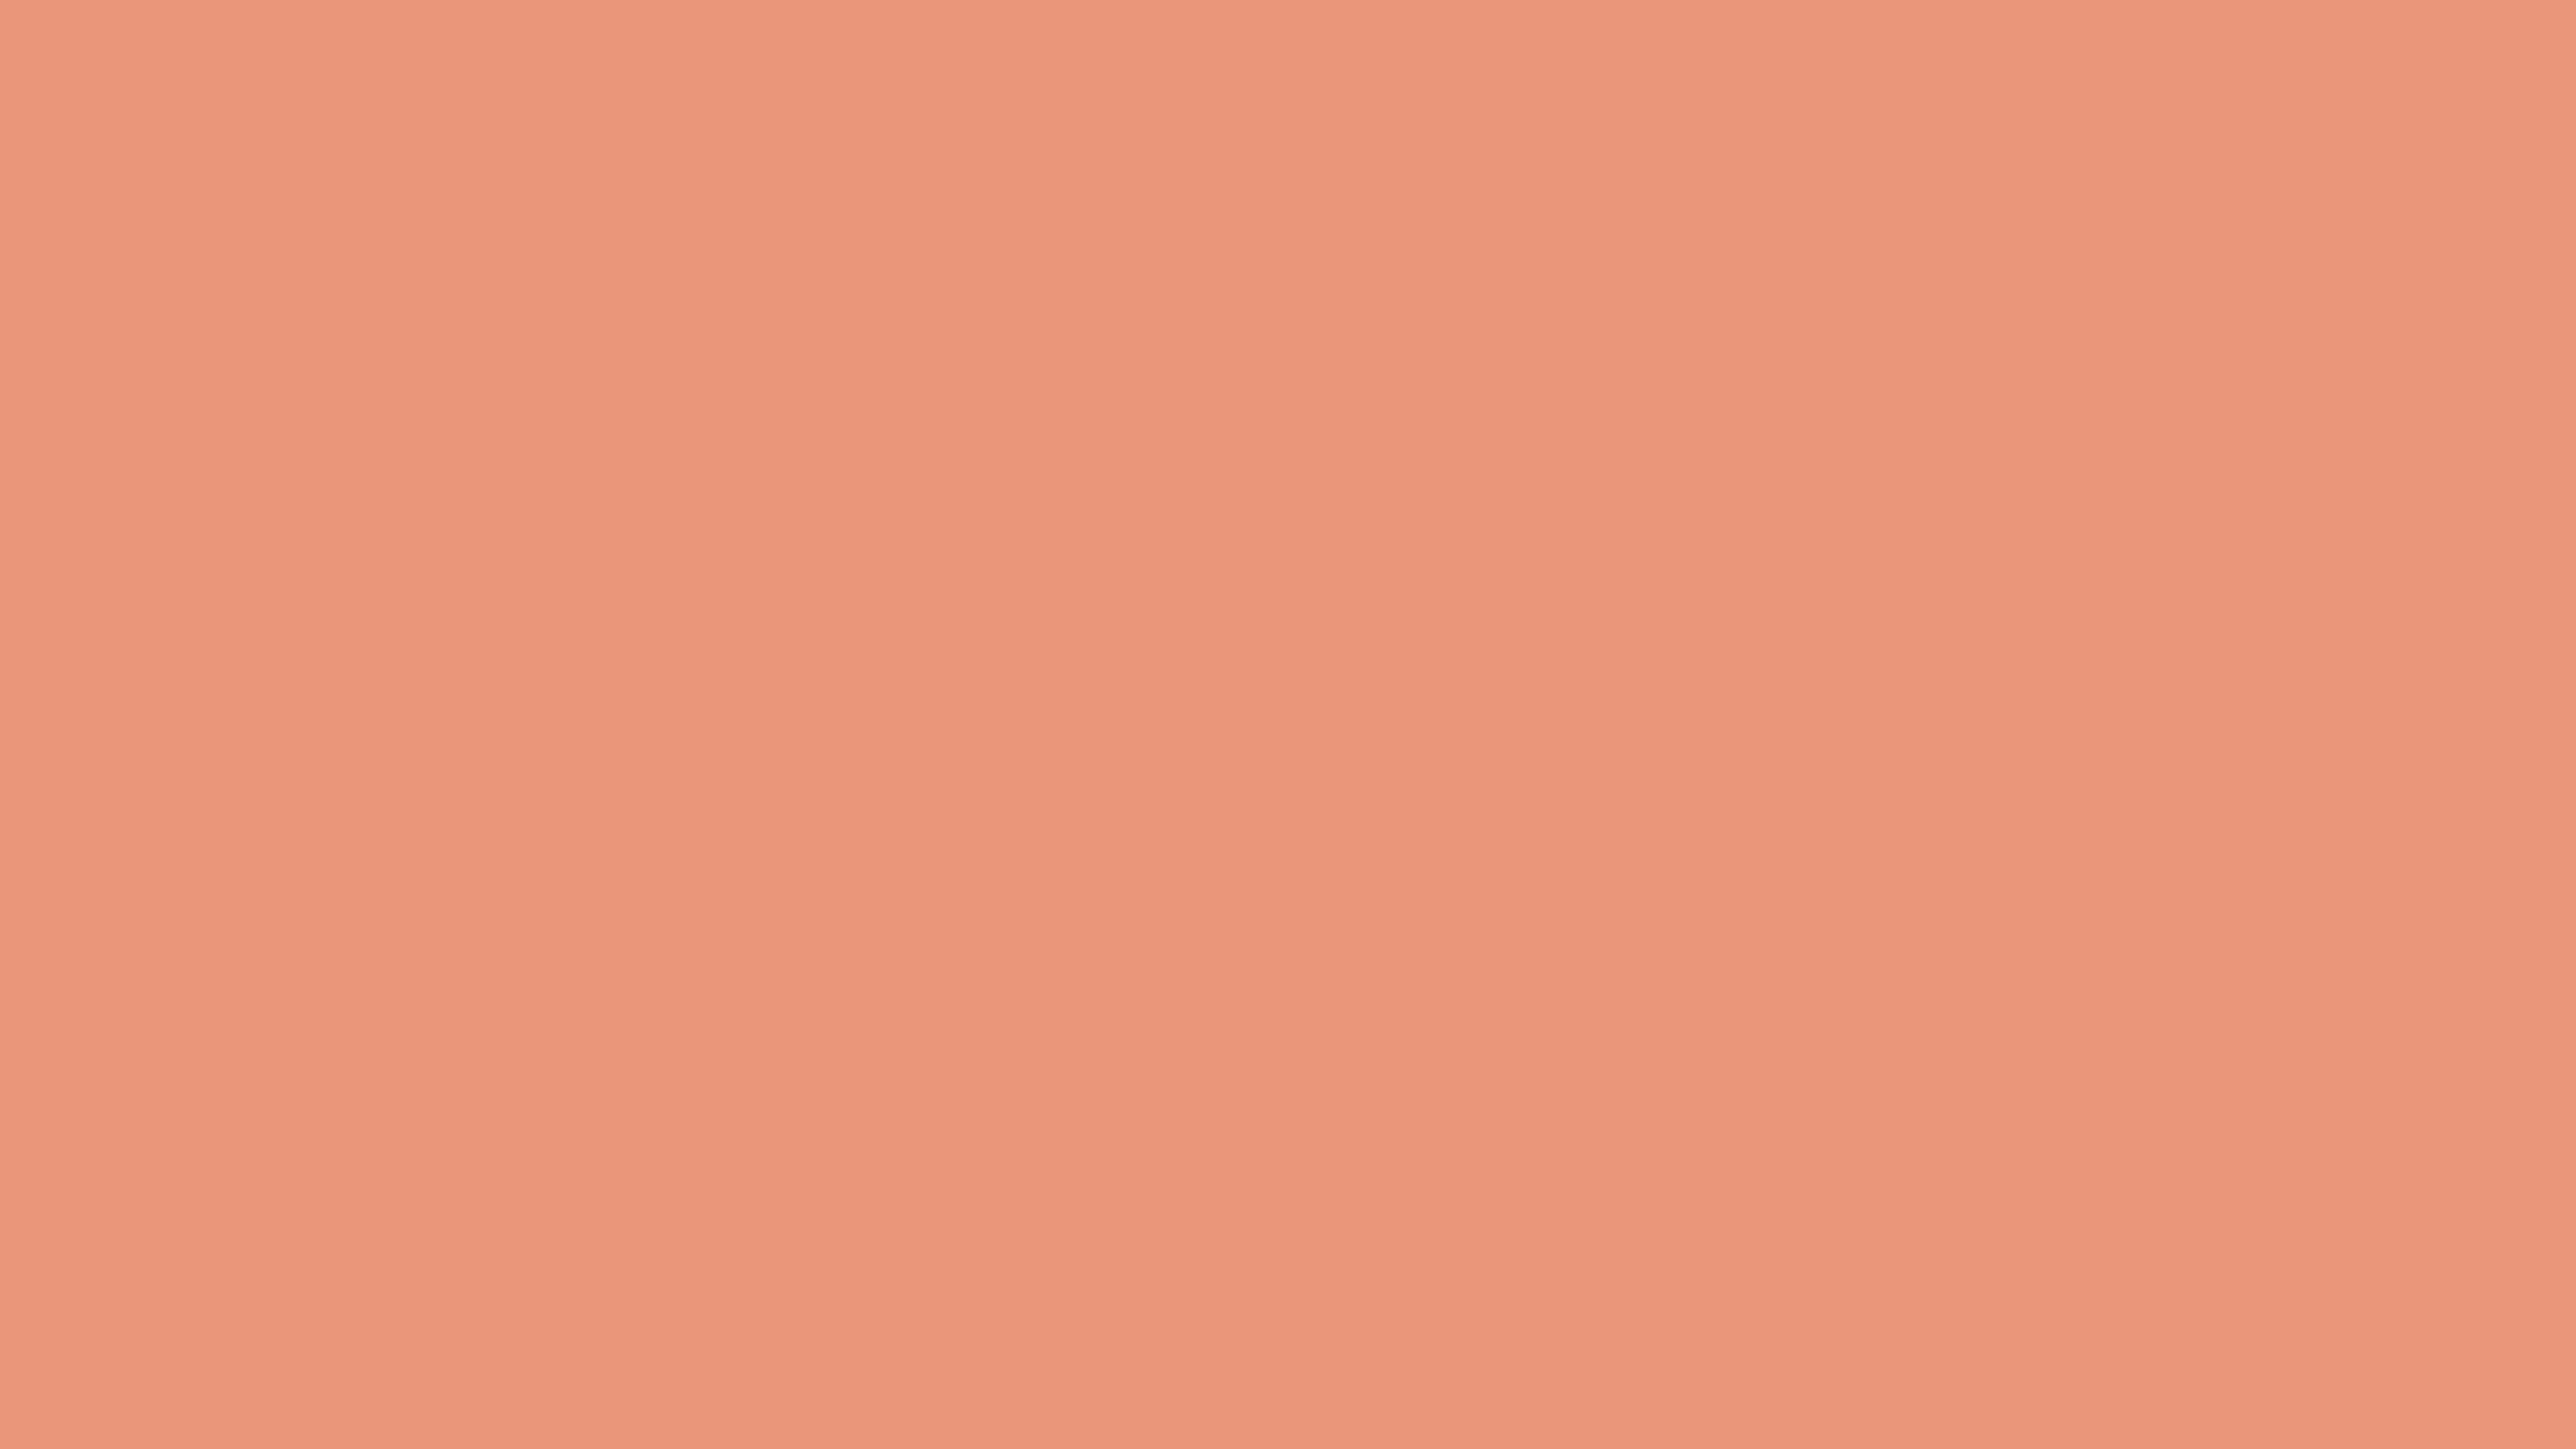 4096x2304 Dark Salmon Solid Color Background